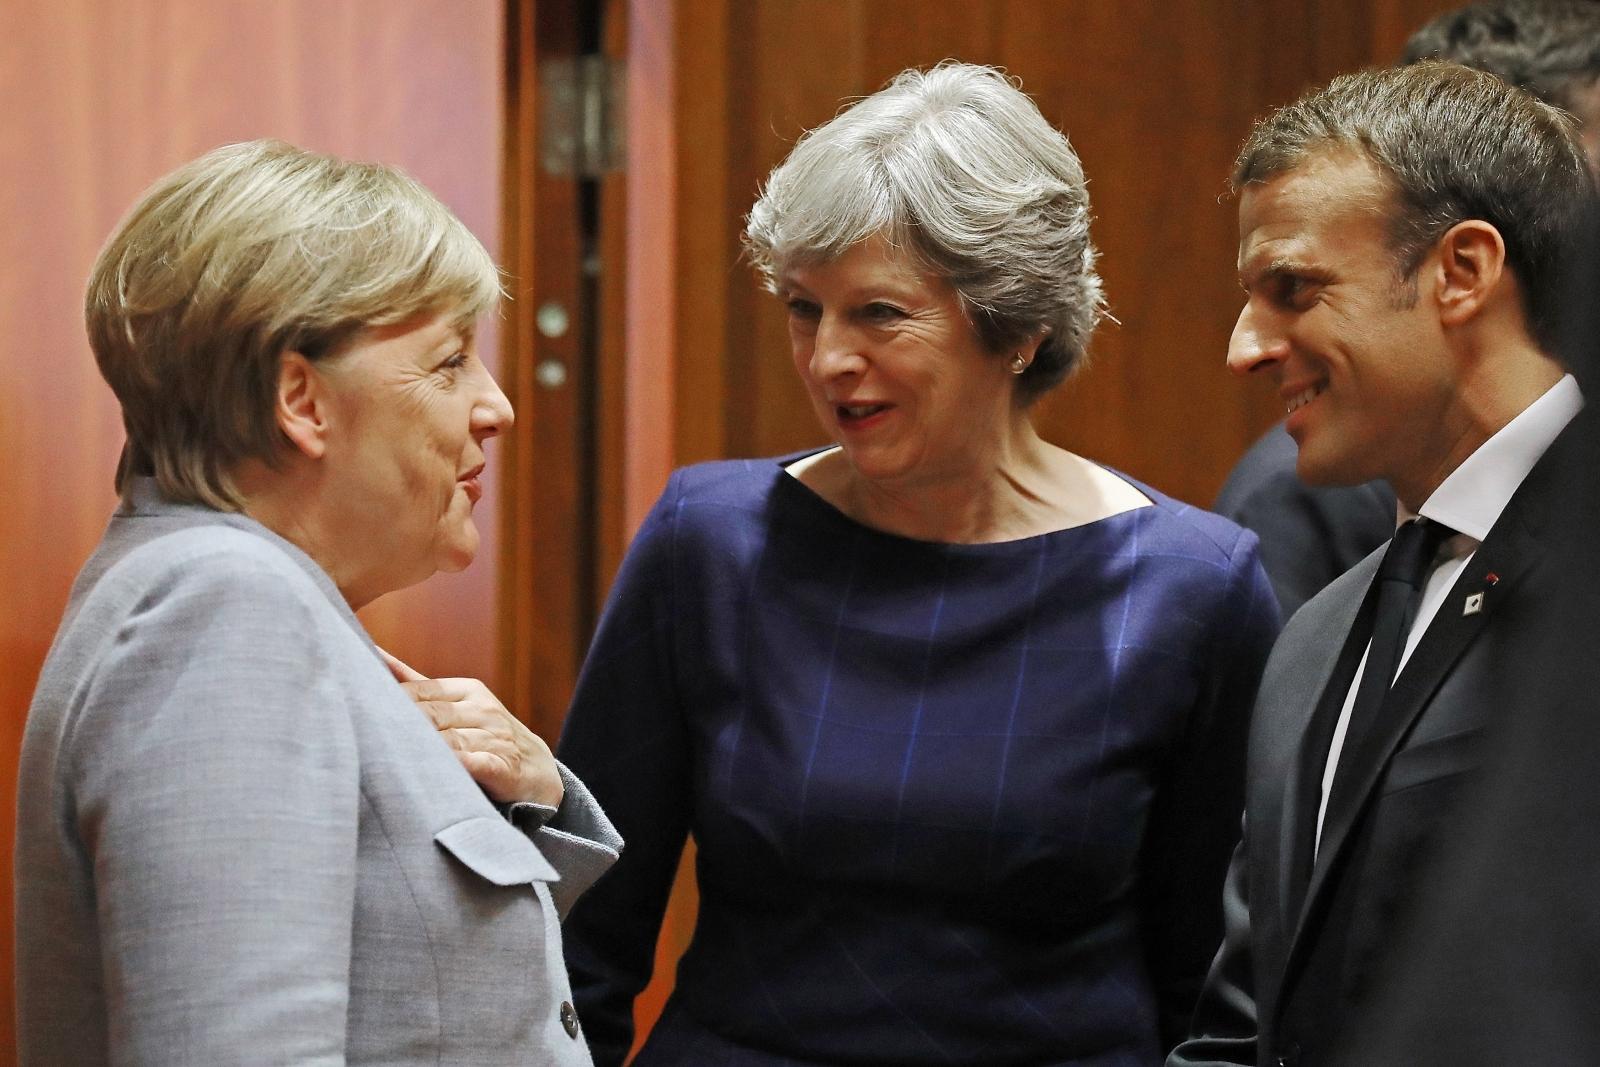 Angela Merkel, Theresa May and Emmanuel Macron